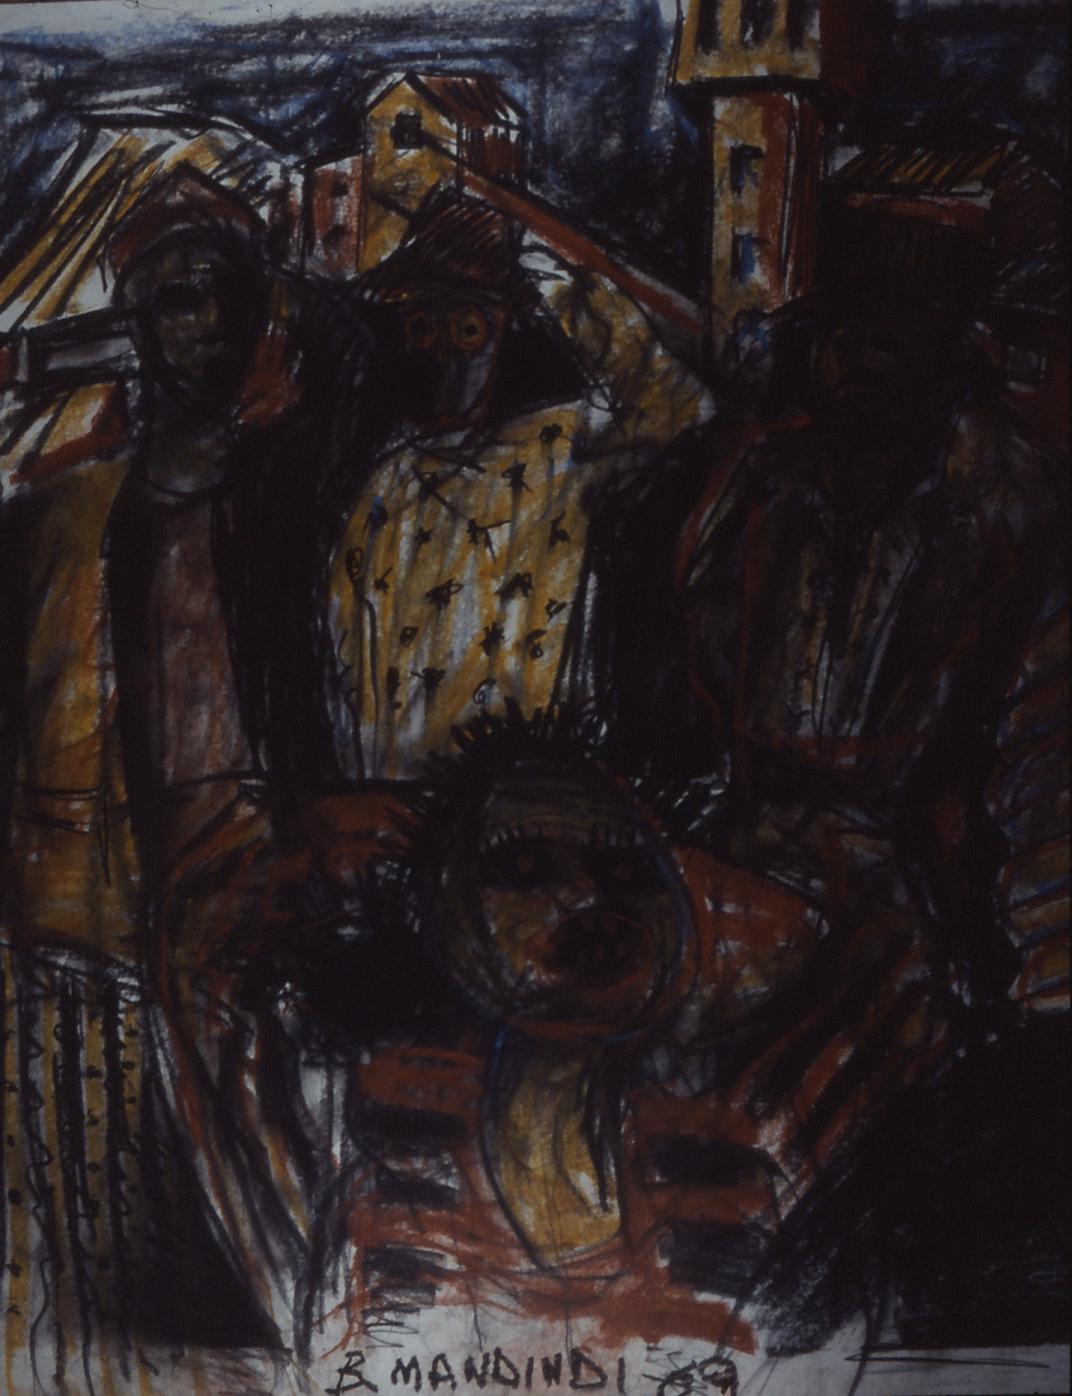 Billy Mandindi, 1989.